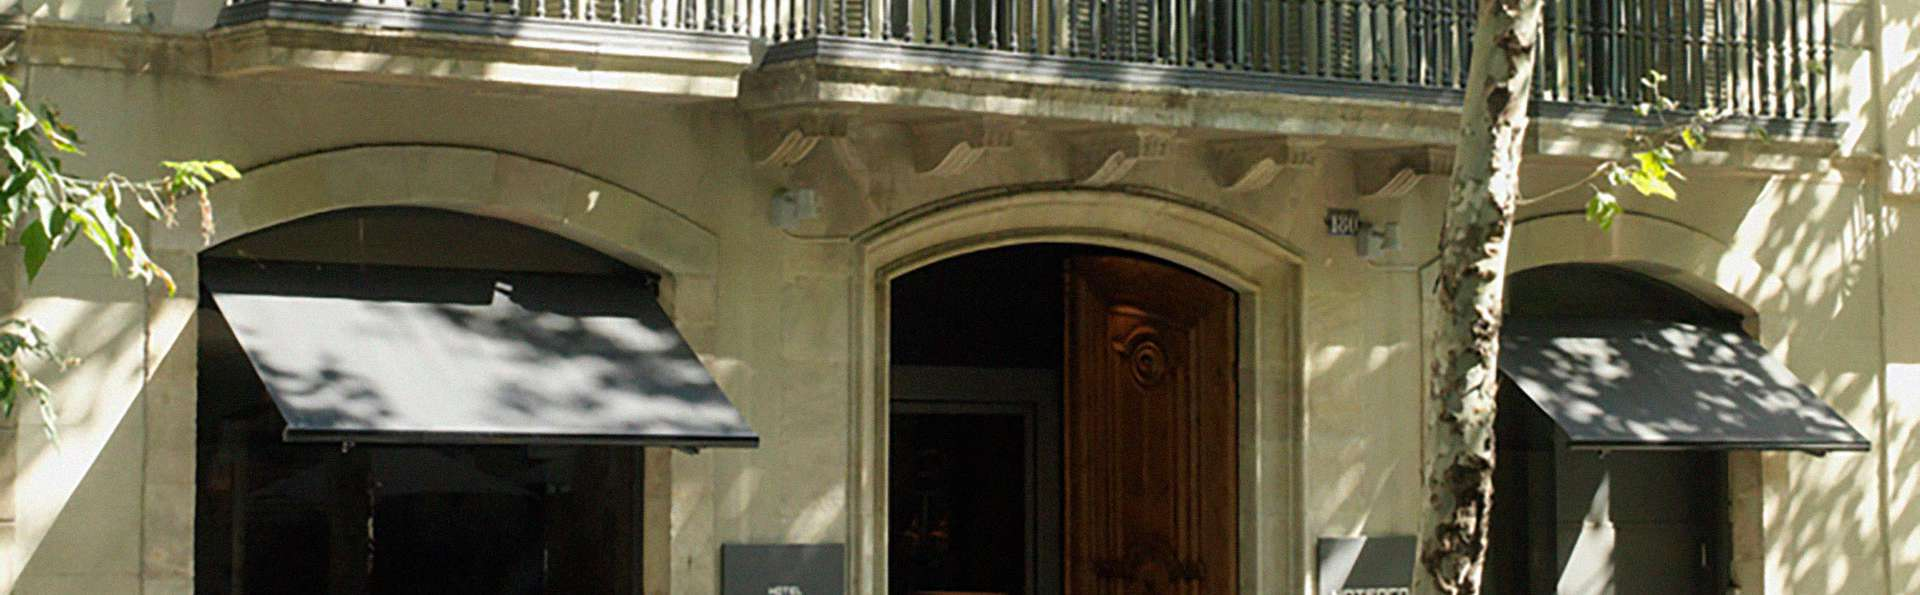 Hotel Advance Barcelona - EDIT_FRONT_02.jpg